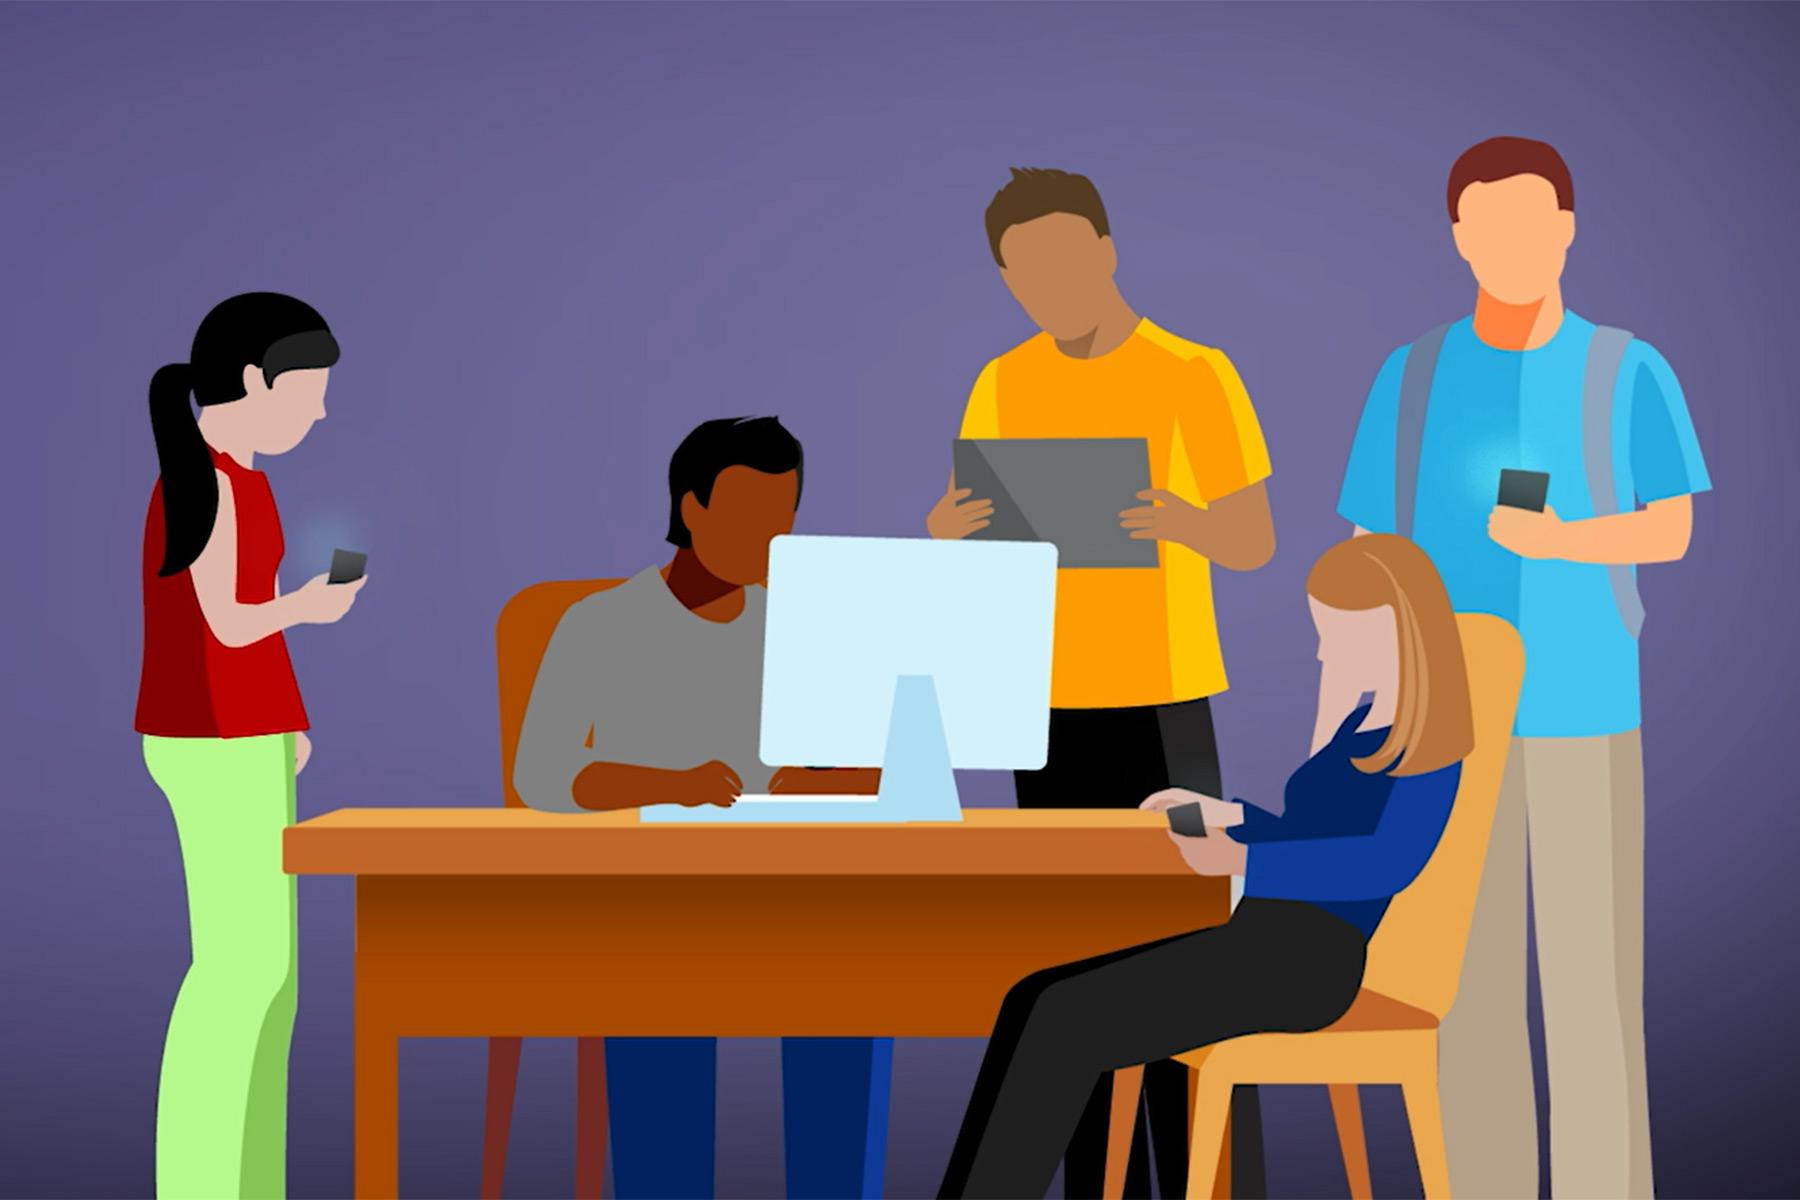 teens looking at screens